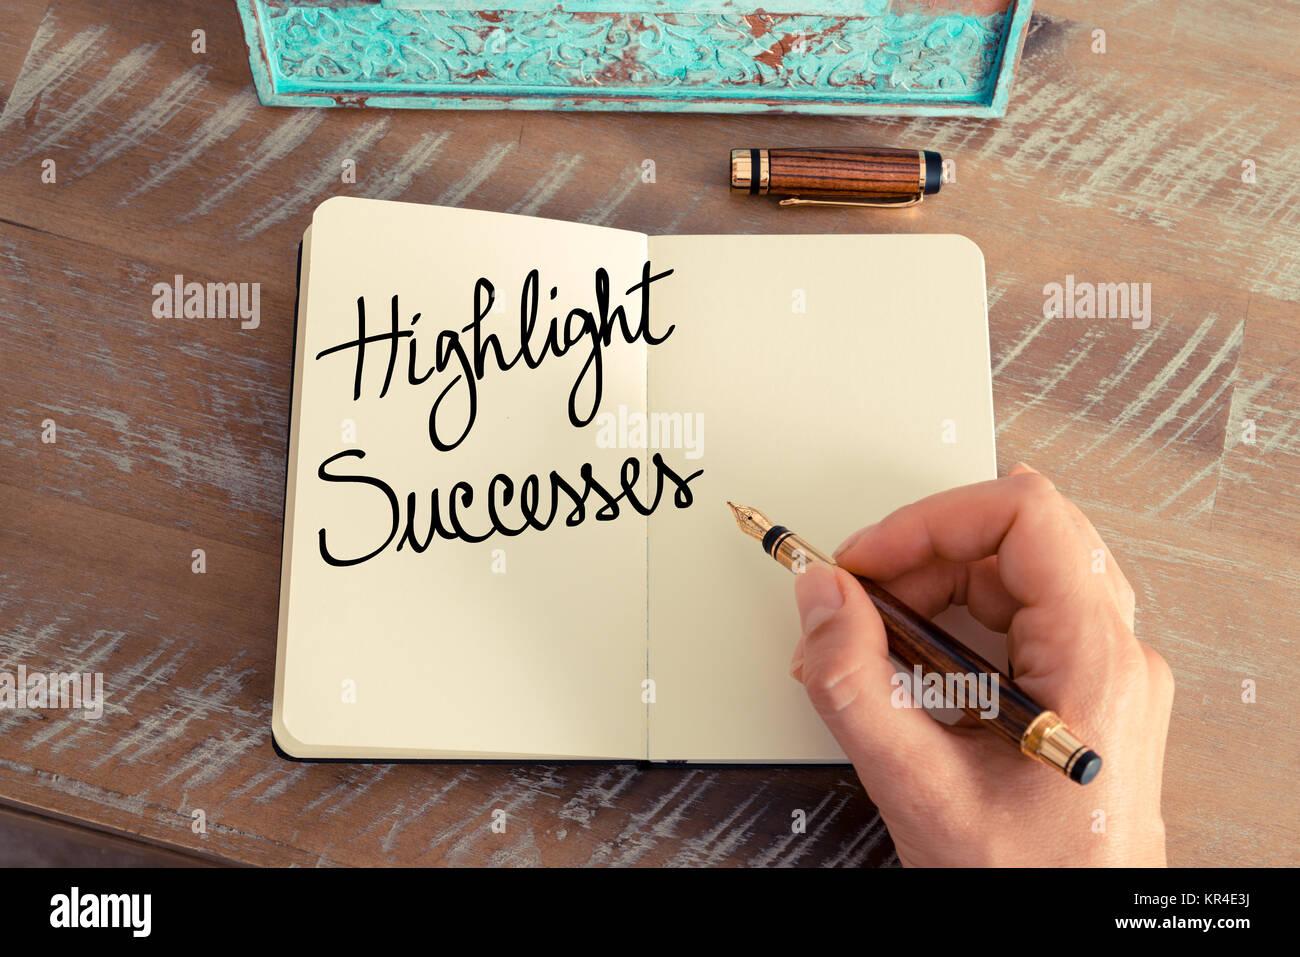 Handwritten text Highlight Successes - Stock Image